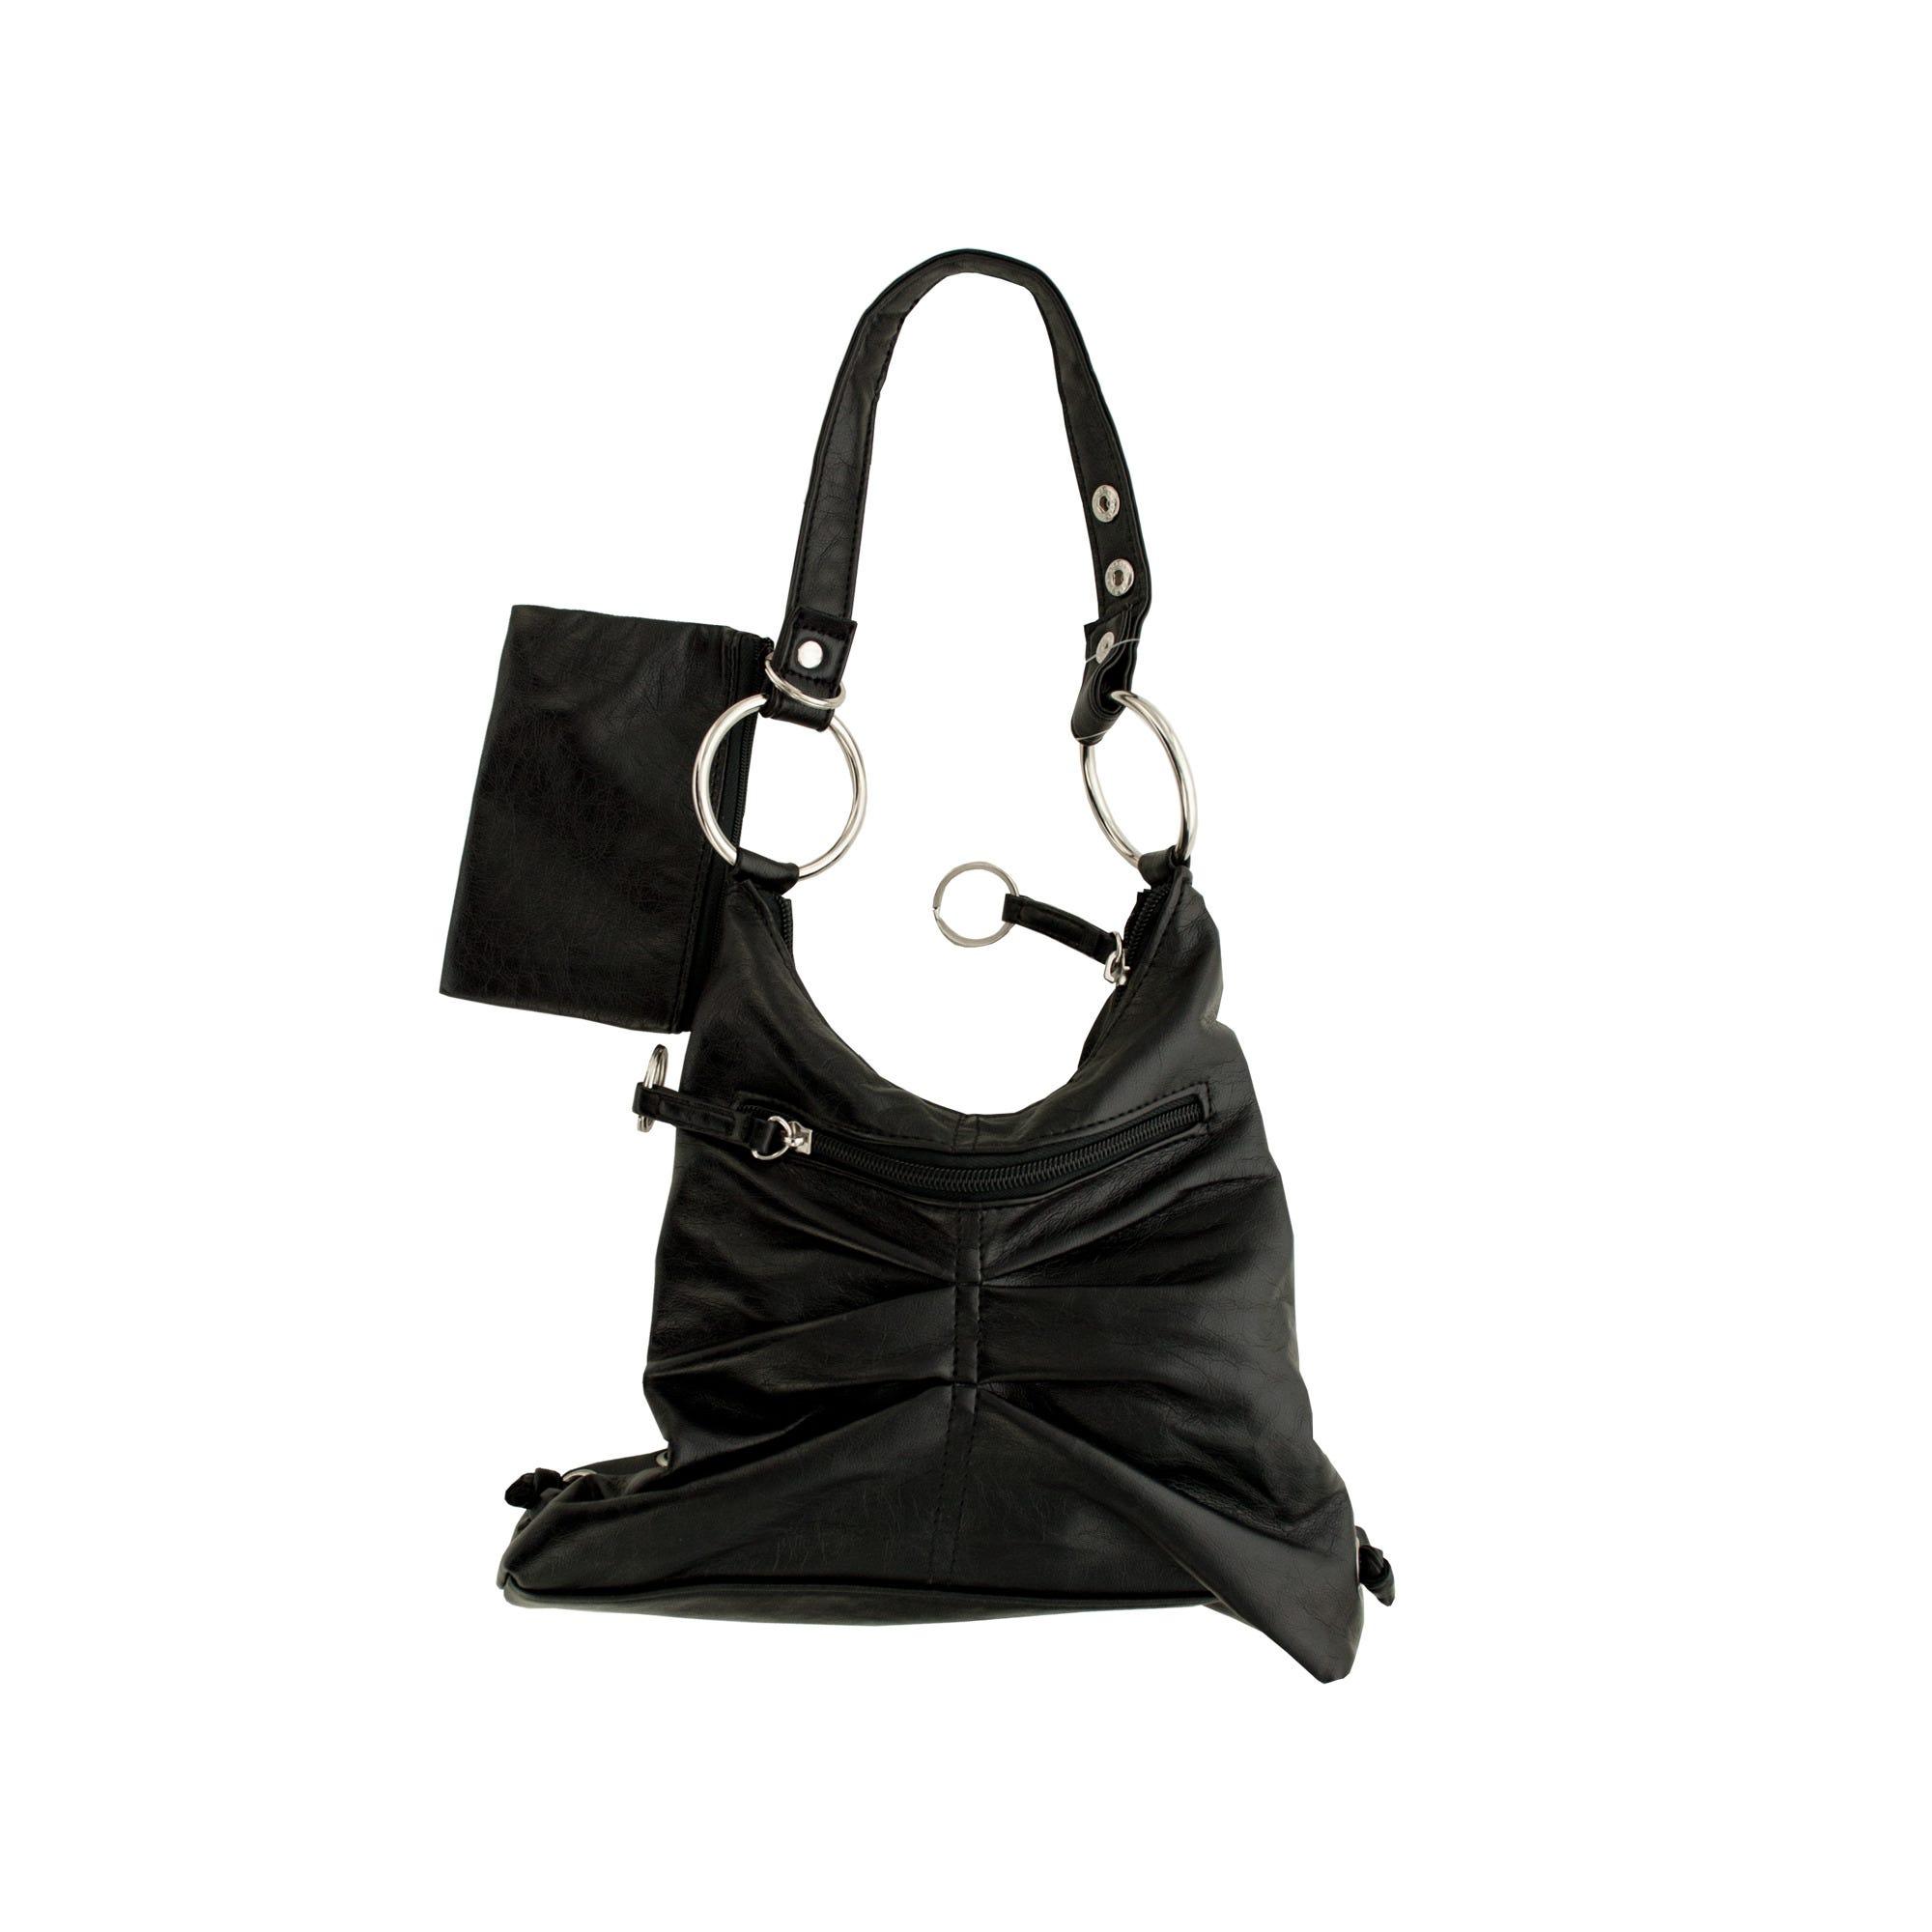 Black HANDBAG with Zipper Case- Qty 8